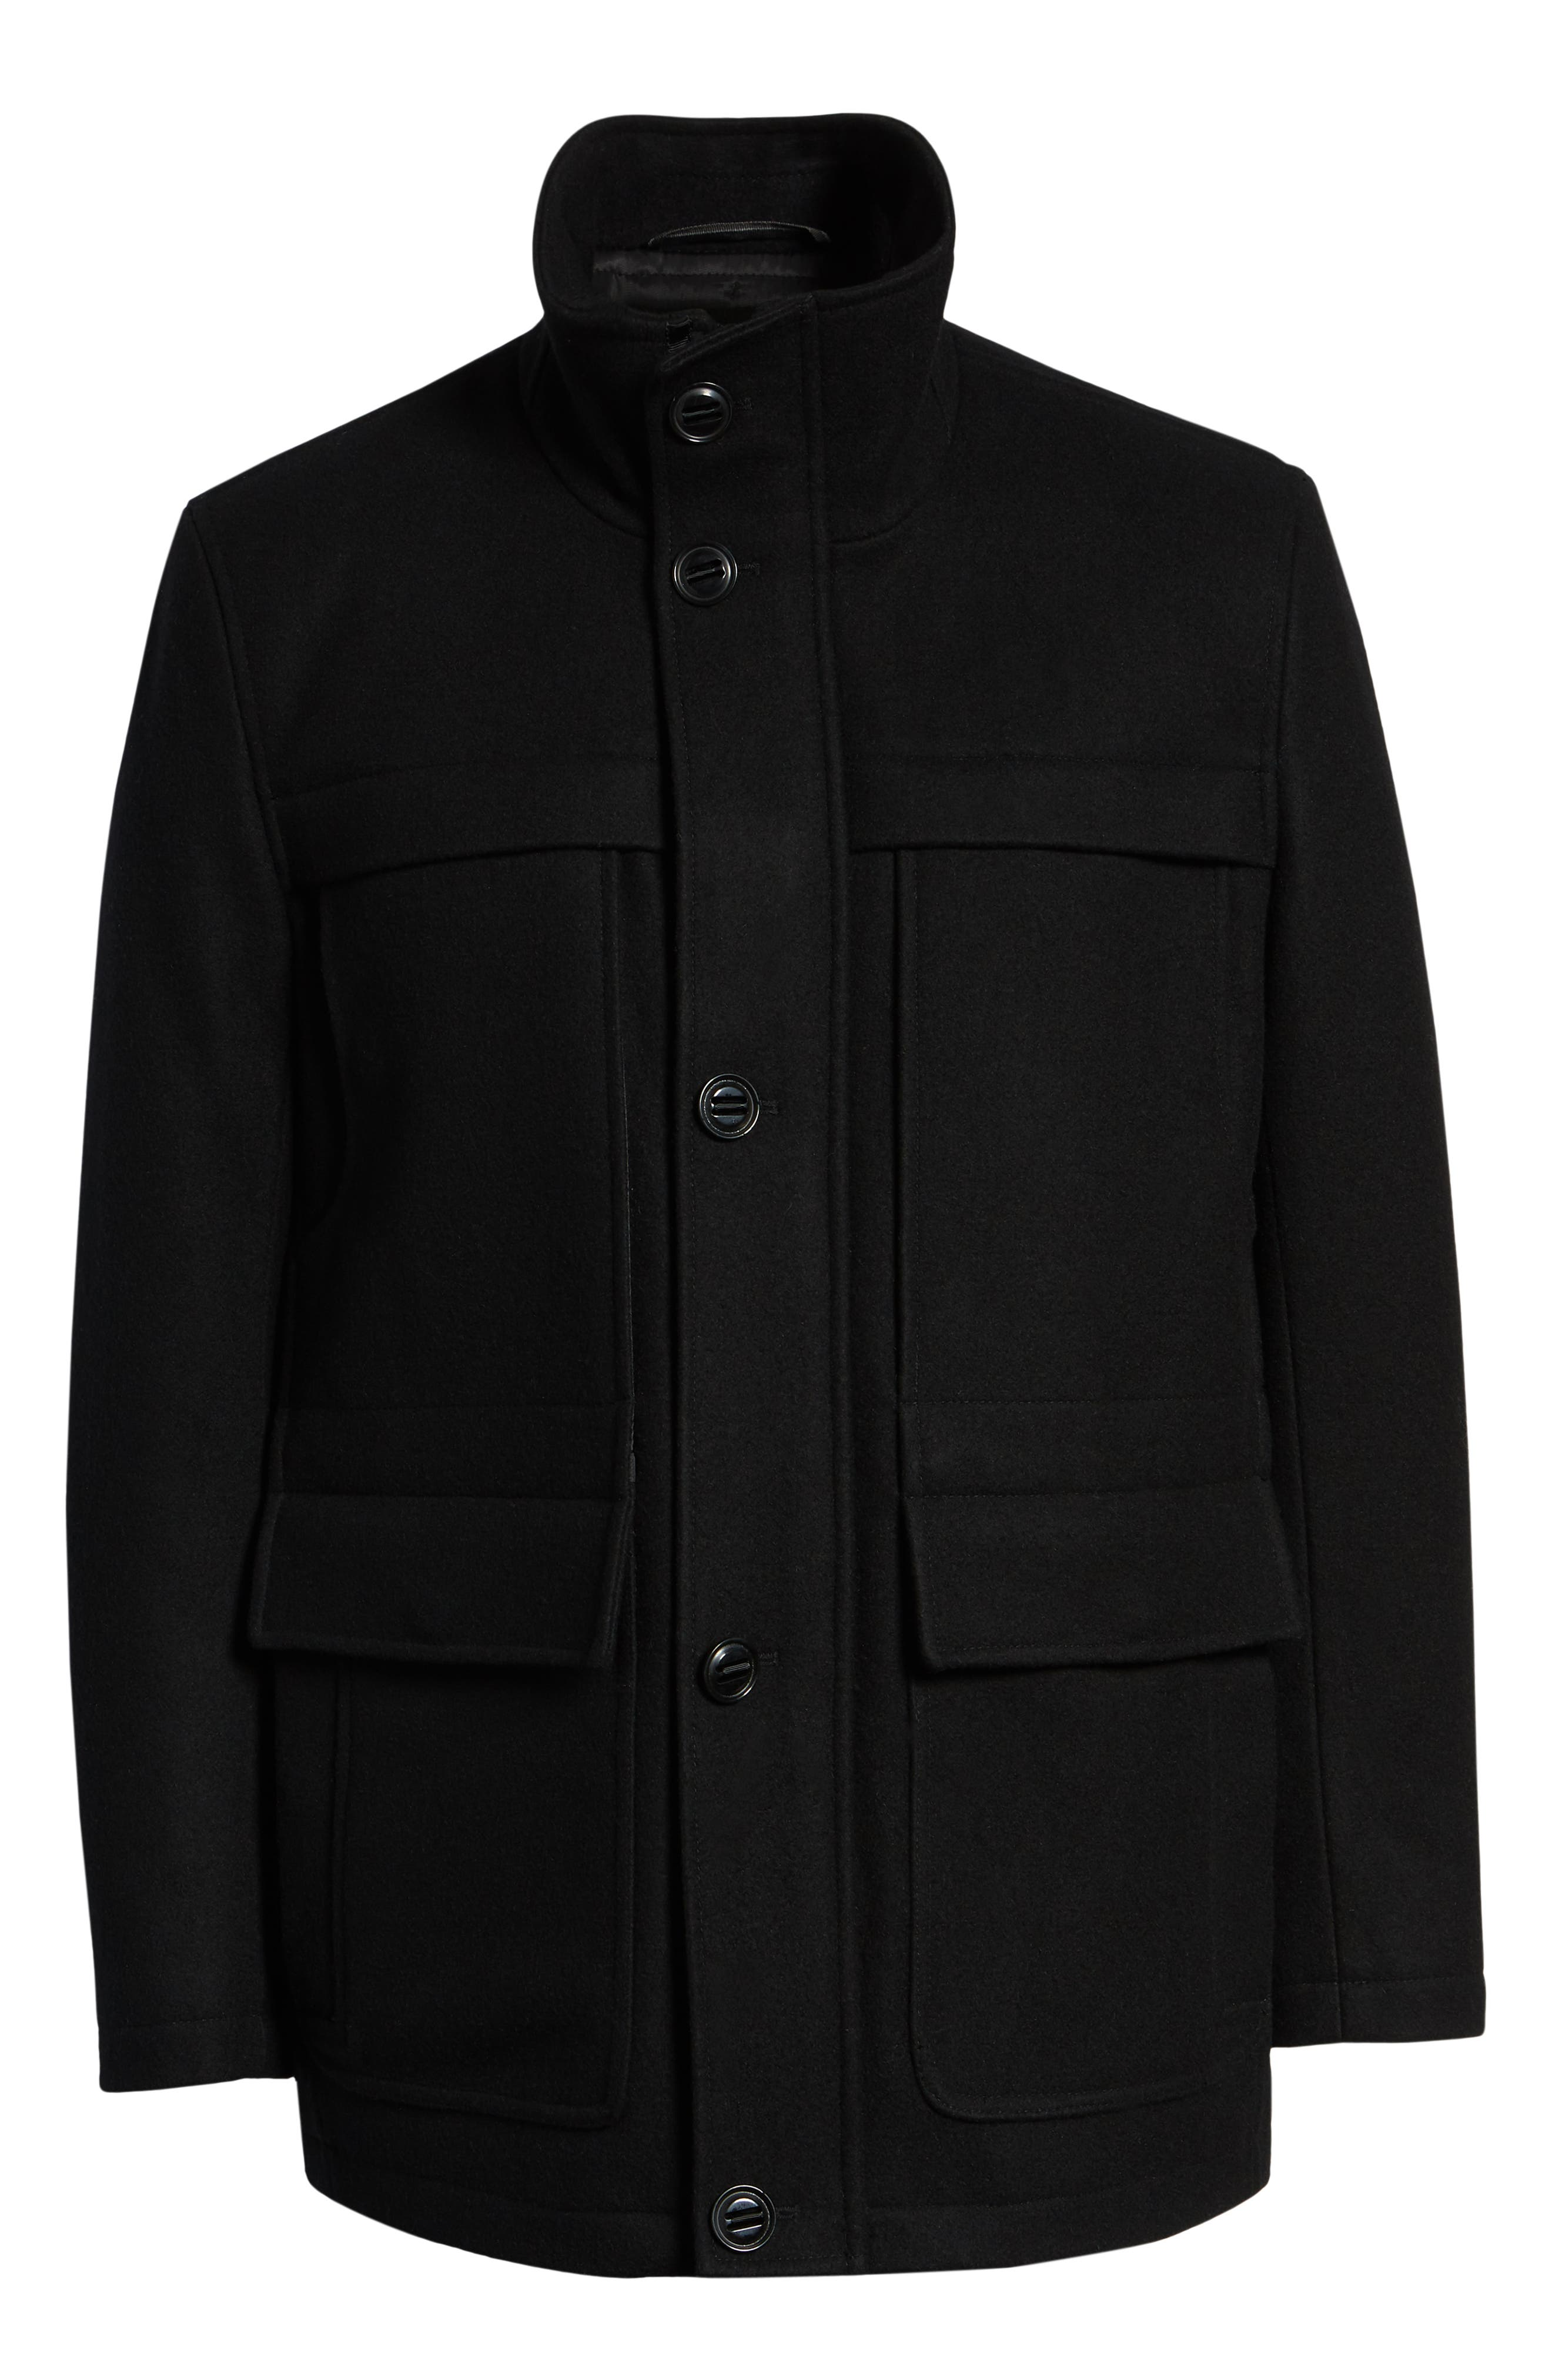 MARC NEW YORK, Brantley Wool Blend Car Coat, Alternate thumbnail 6, color, 001